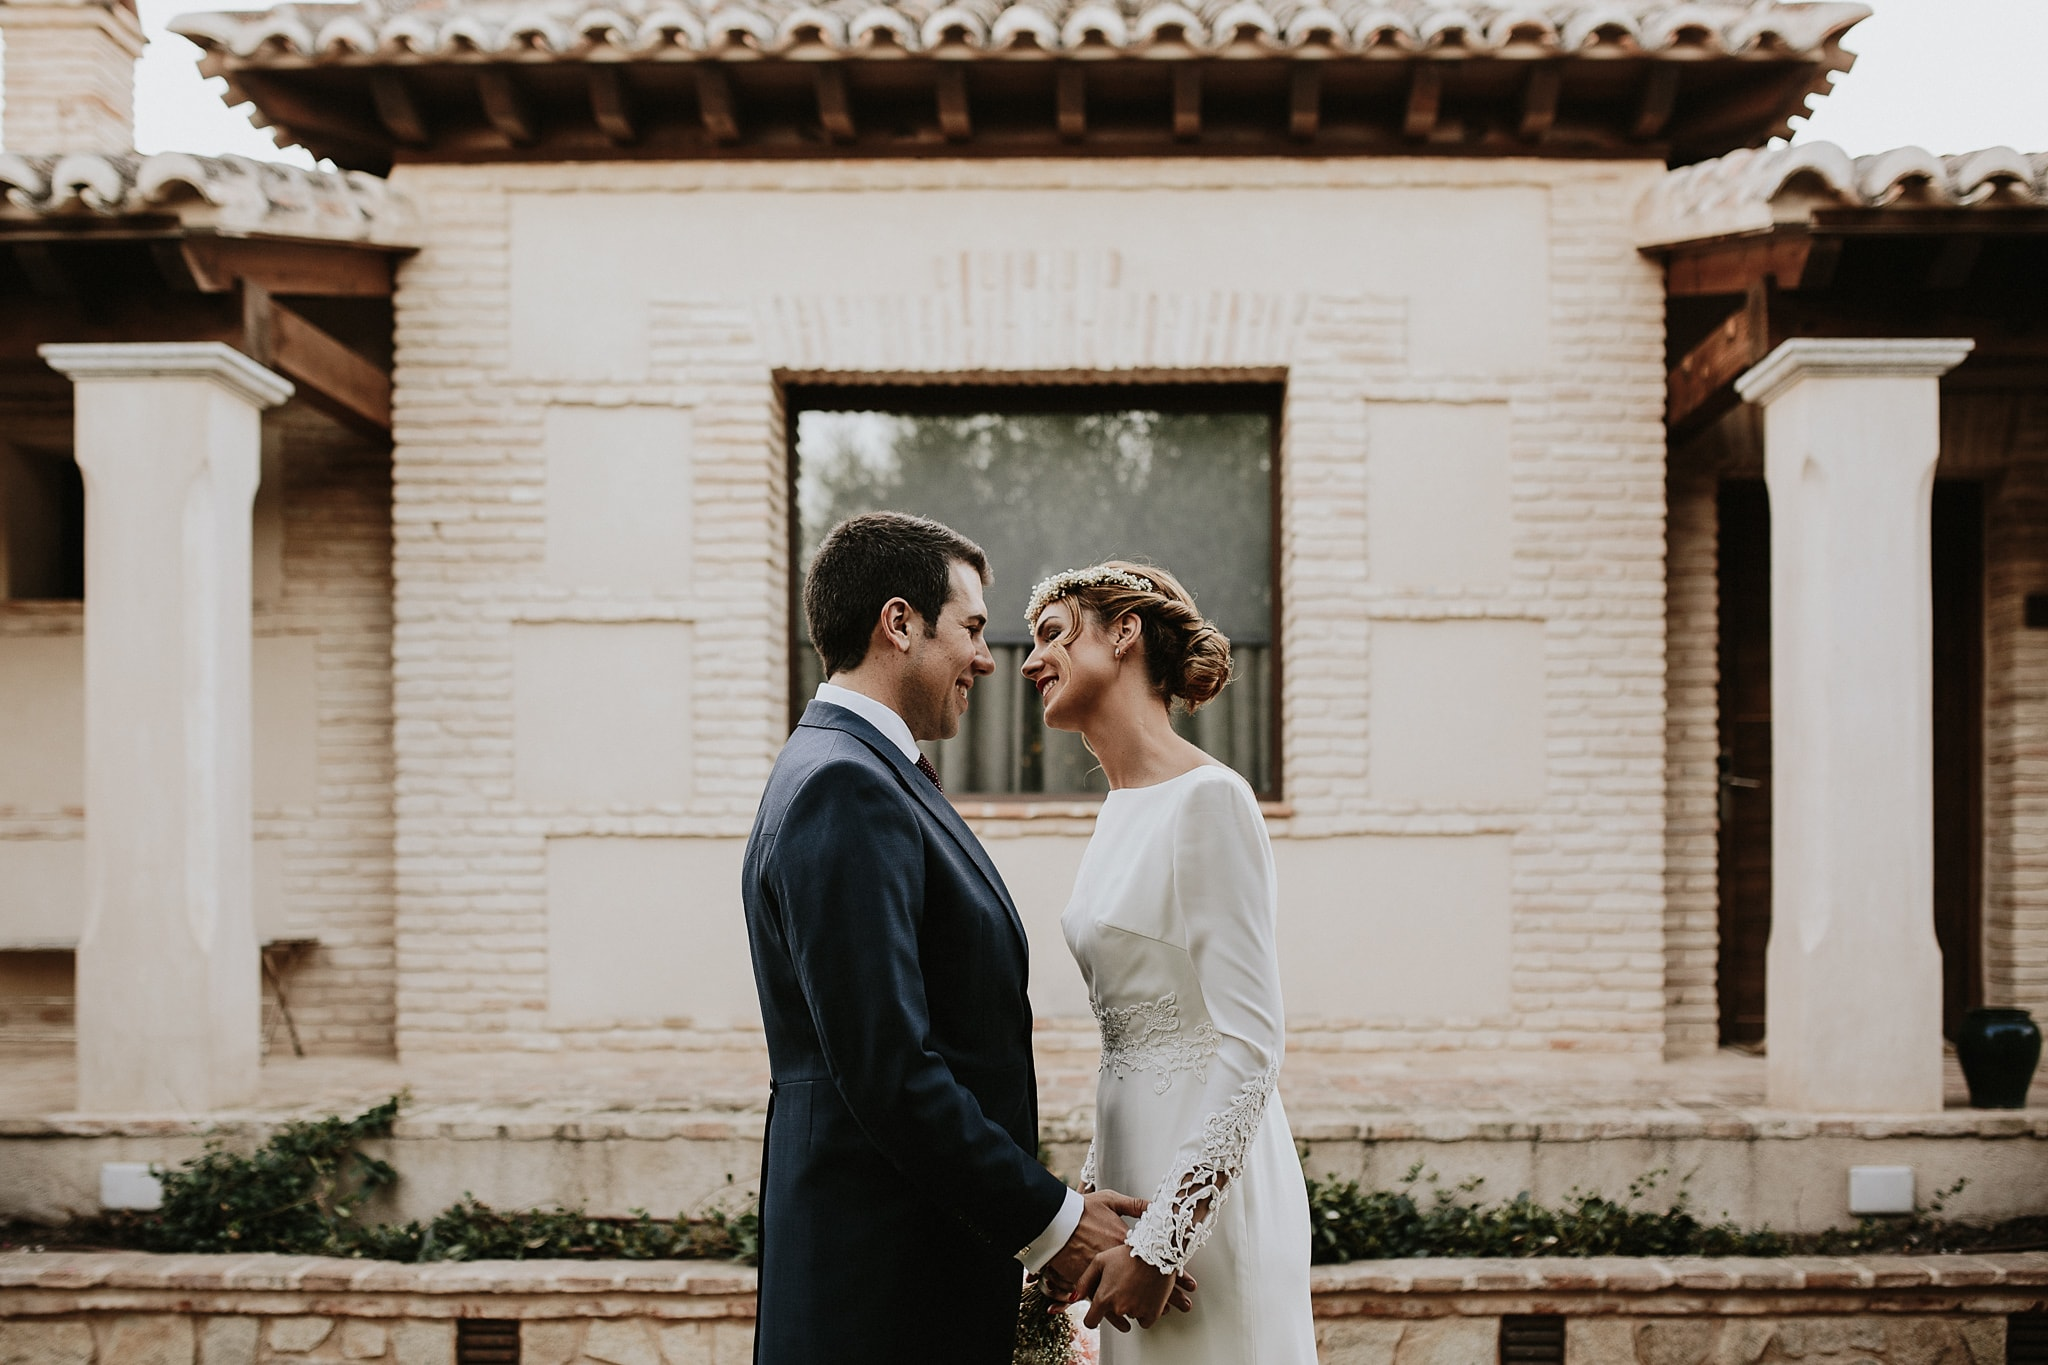 prisma-blanco-fotografos-bodas-toledo-85